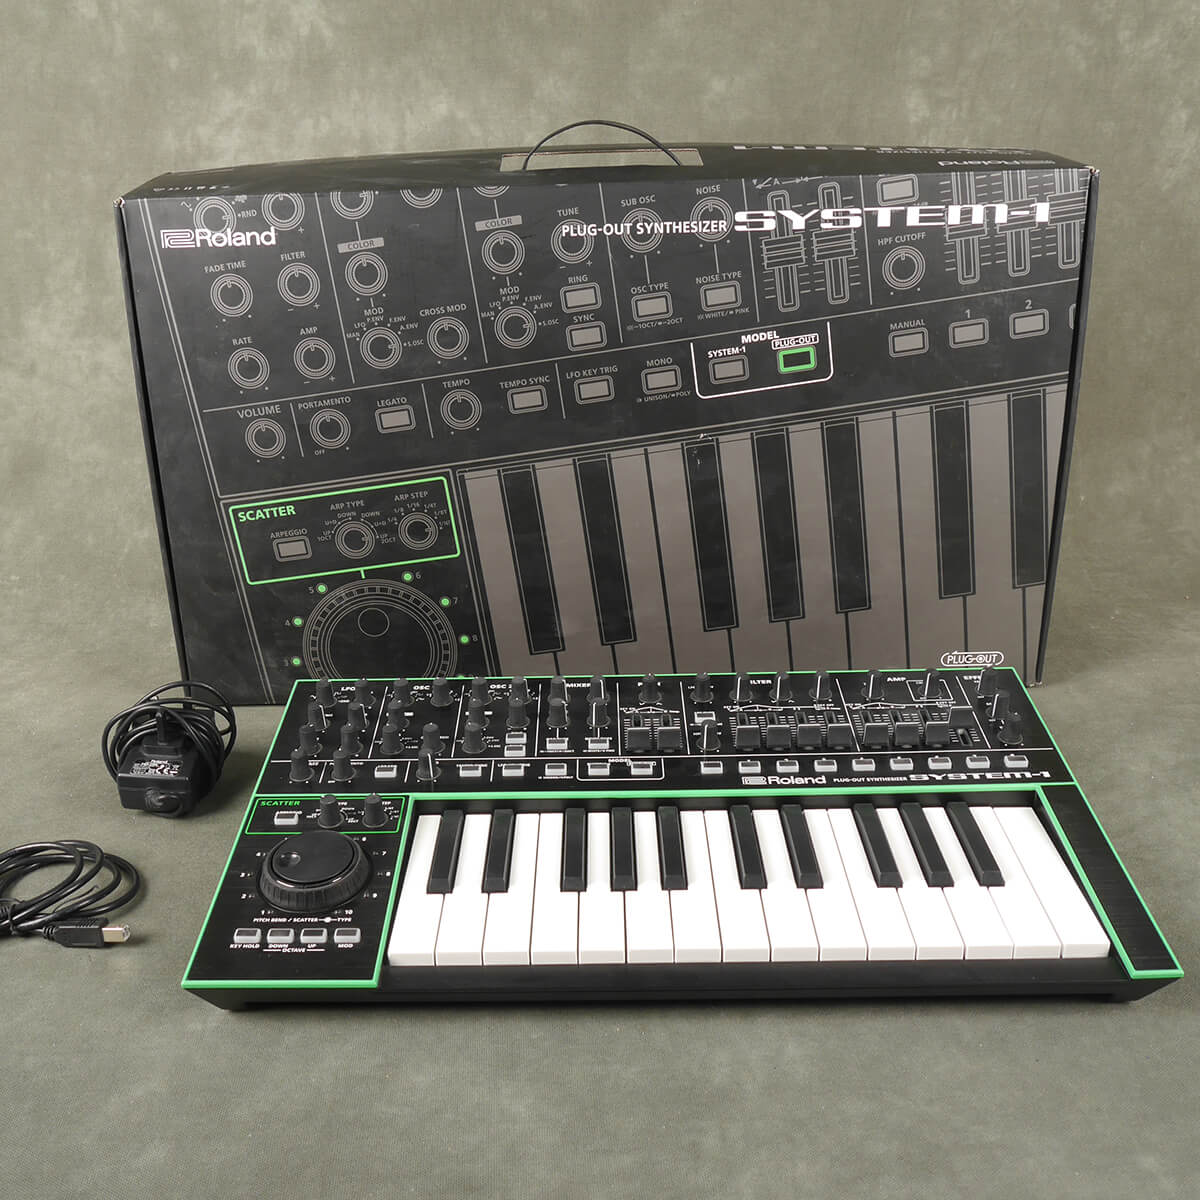 Roland System 1 Plug Out Syntheszier w/Box & PSU - 2nd Hand